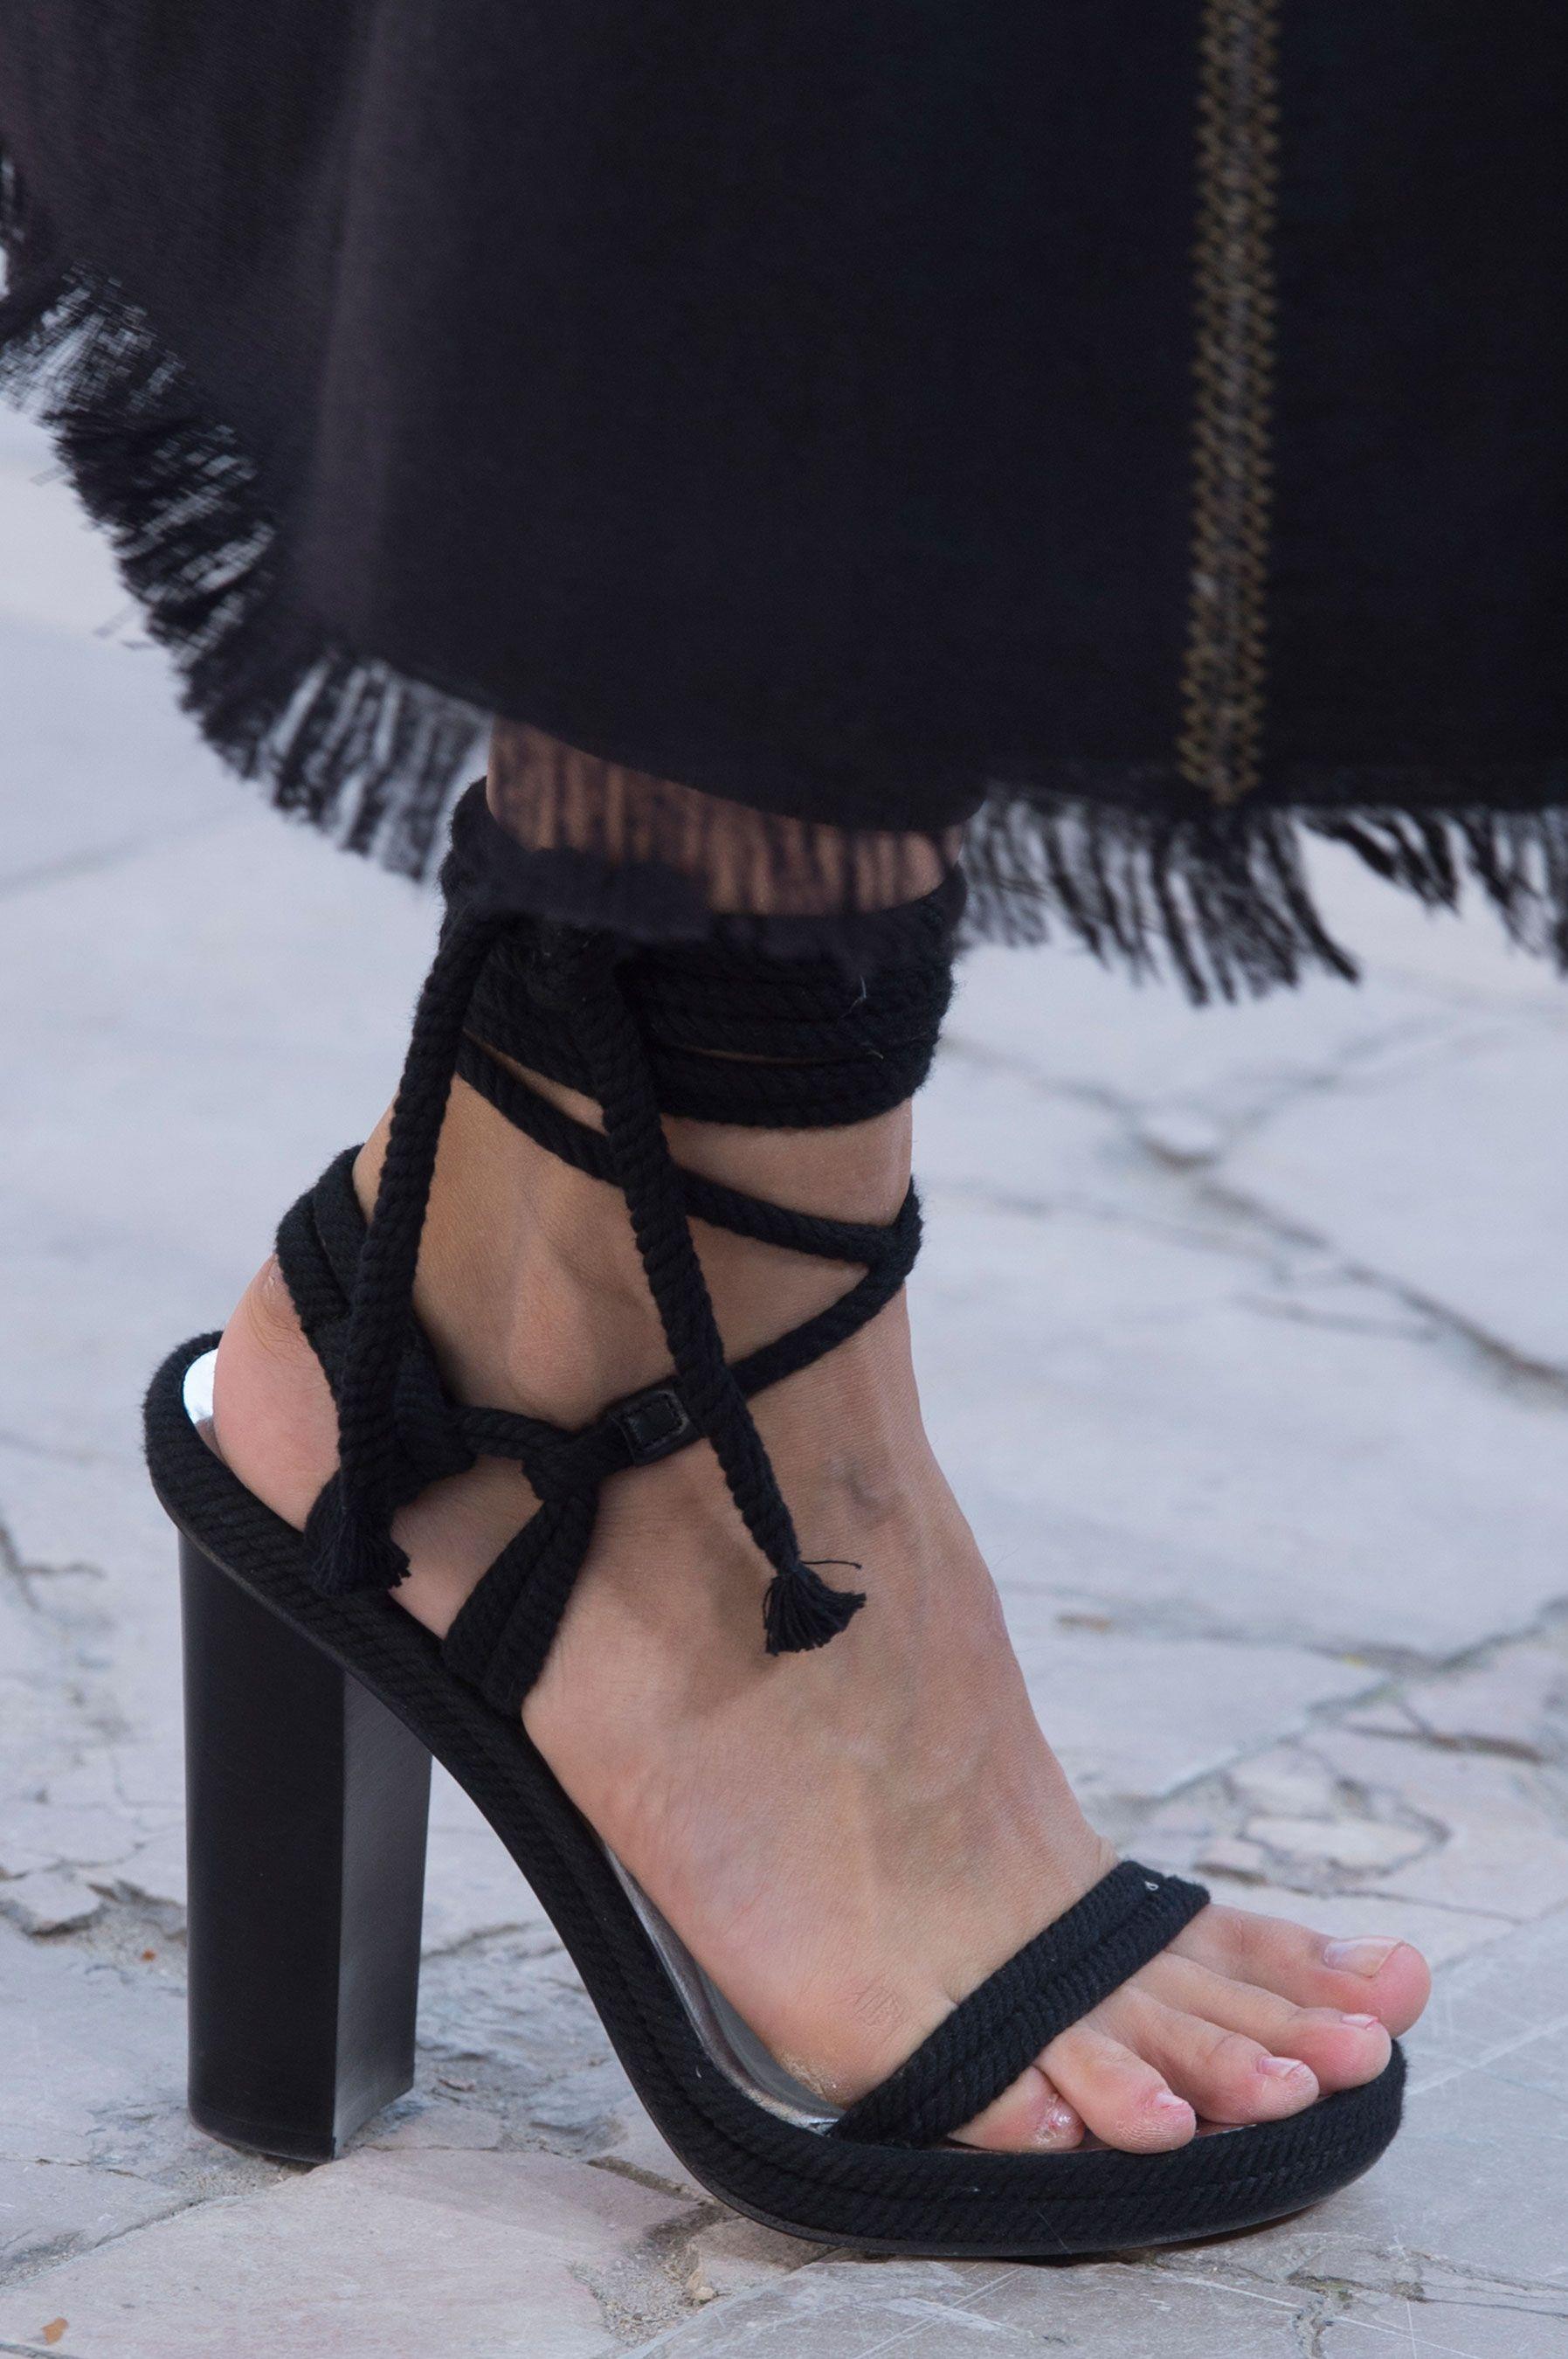 Sandalias Spotlight Shoes Paris Negro The From Best Week Fashion zxw0z7